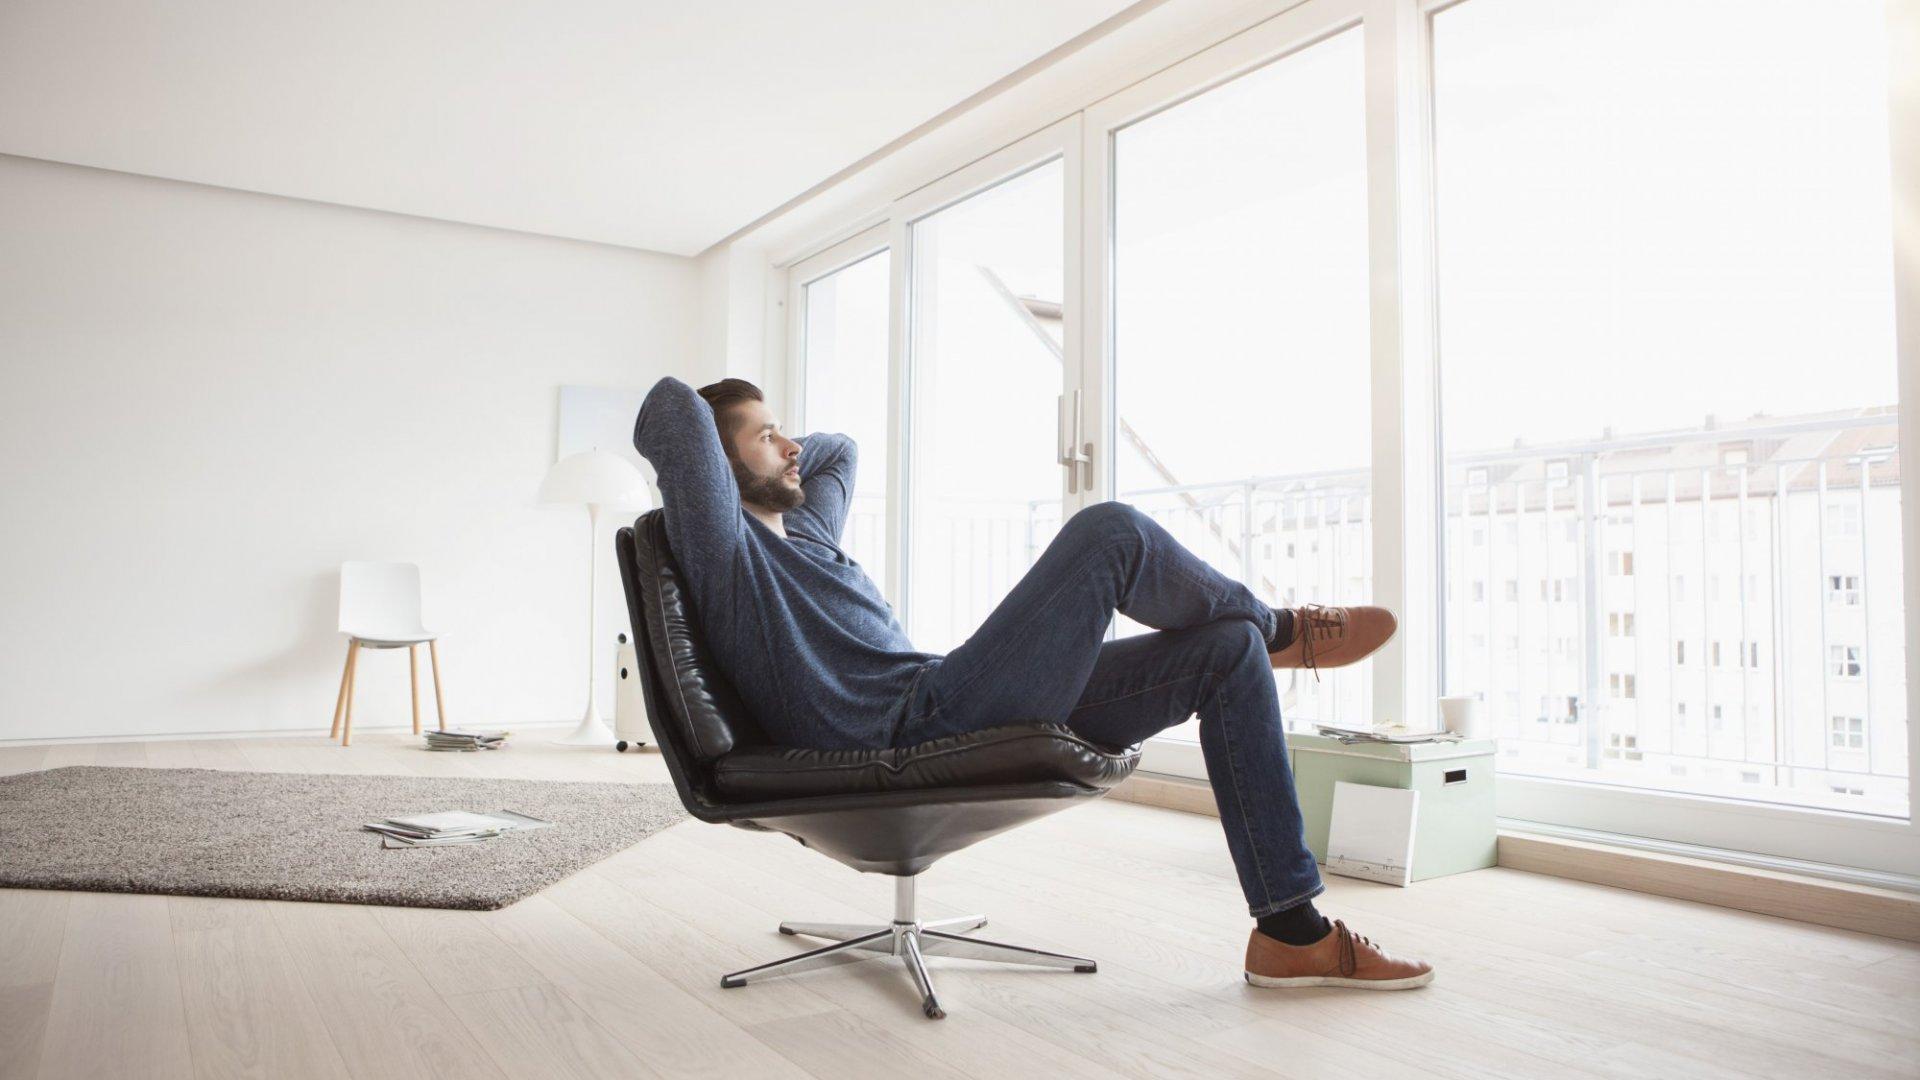 For a More Creative Brain, Take Breaks